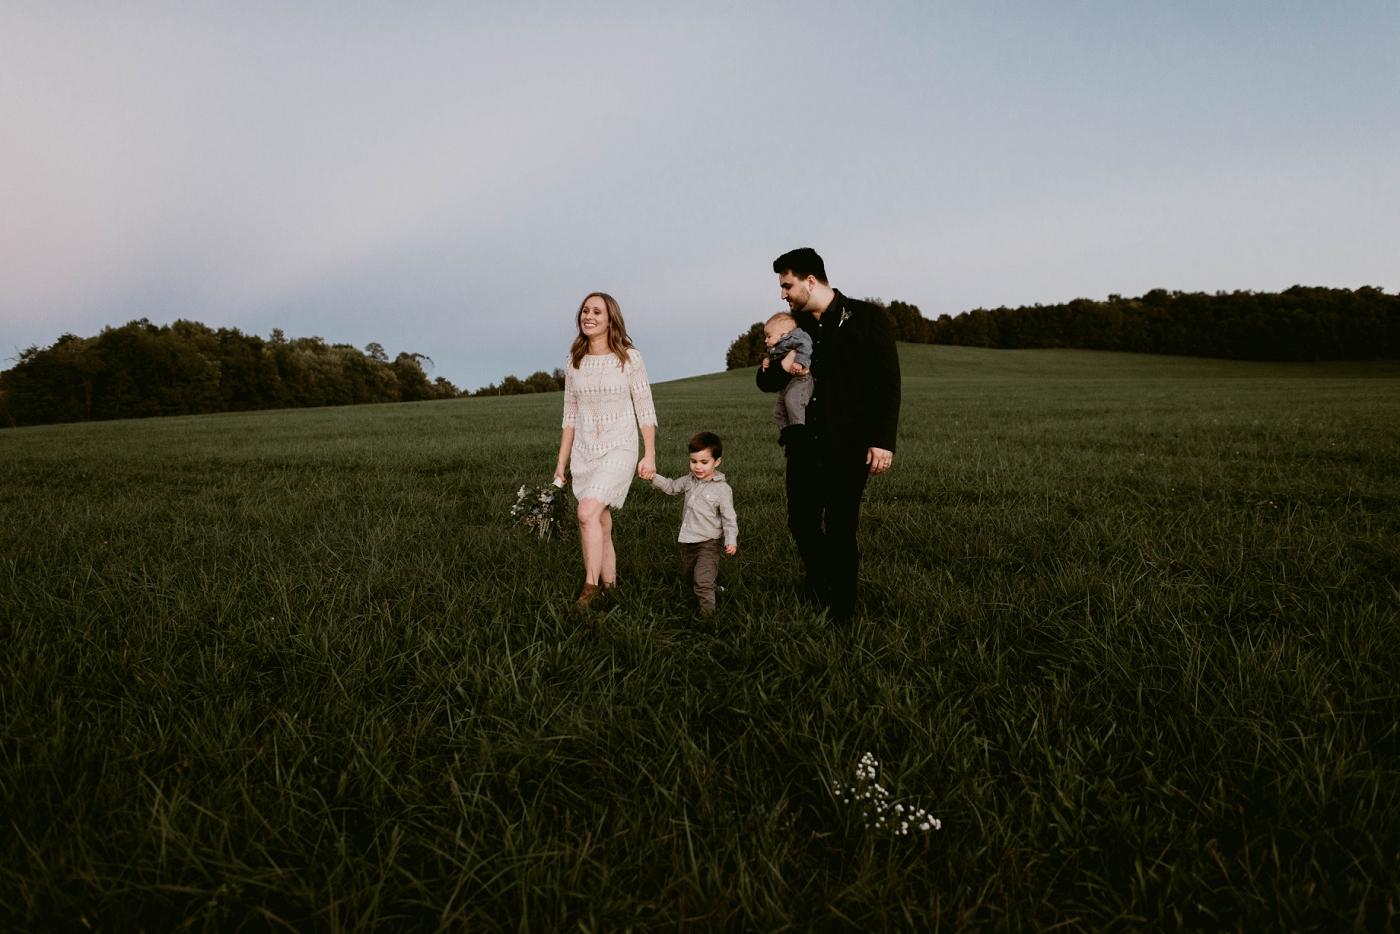 Wildflower-Field-Elopement-Vow-Renewal_Lisa+Chad_MJPHOTO-333.JPG